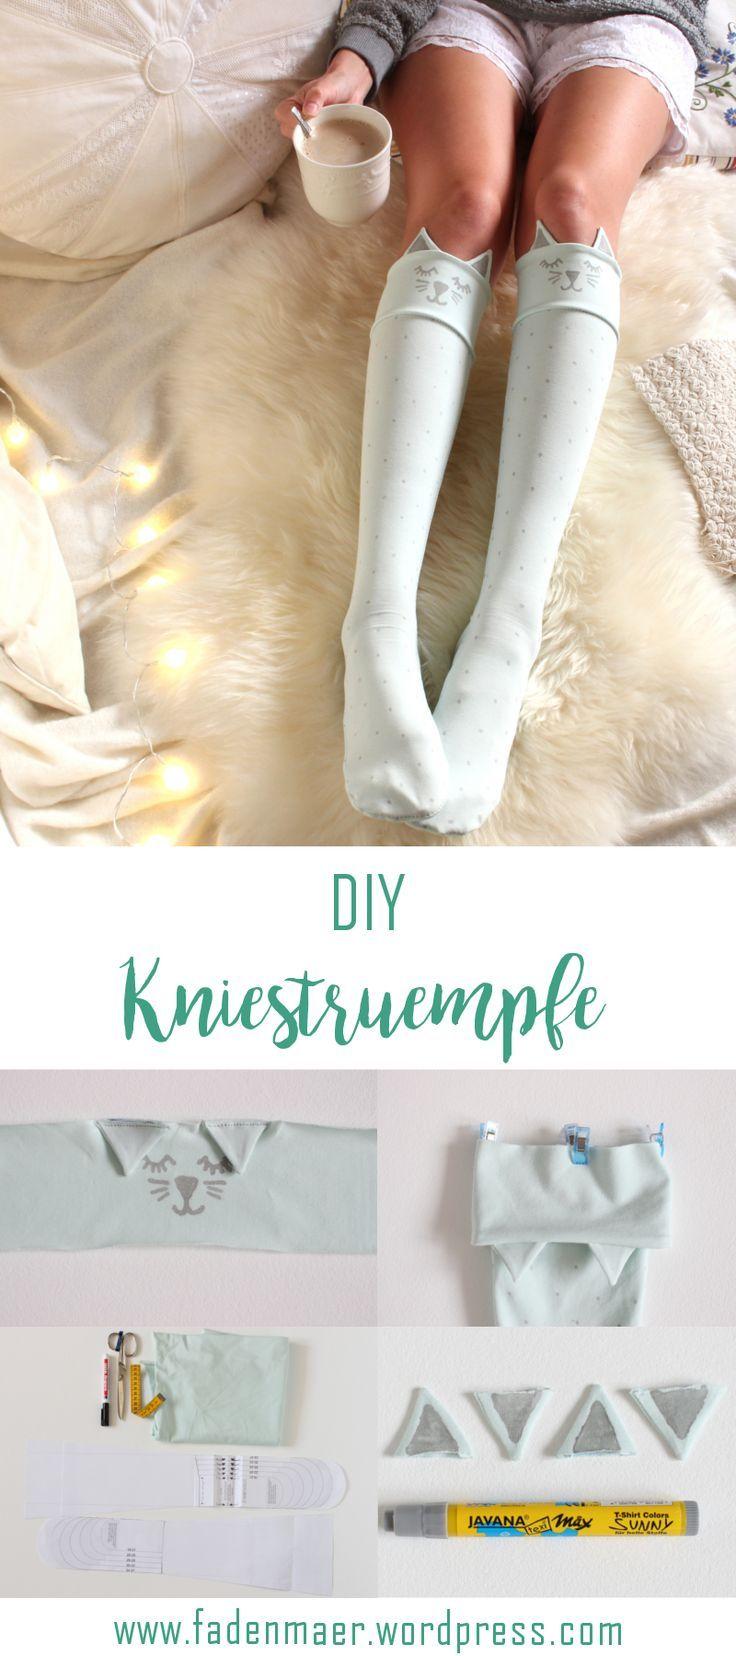 DIY: Kniestrümpfe ganz einfach selber nähen #diyclothes